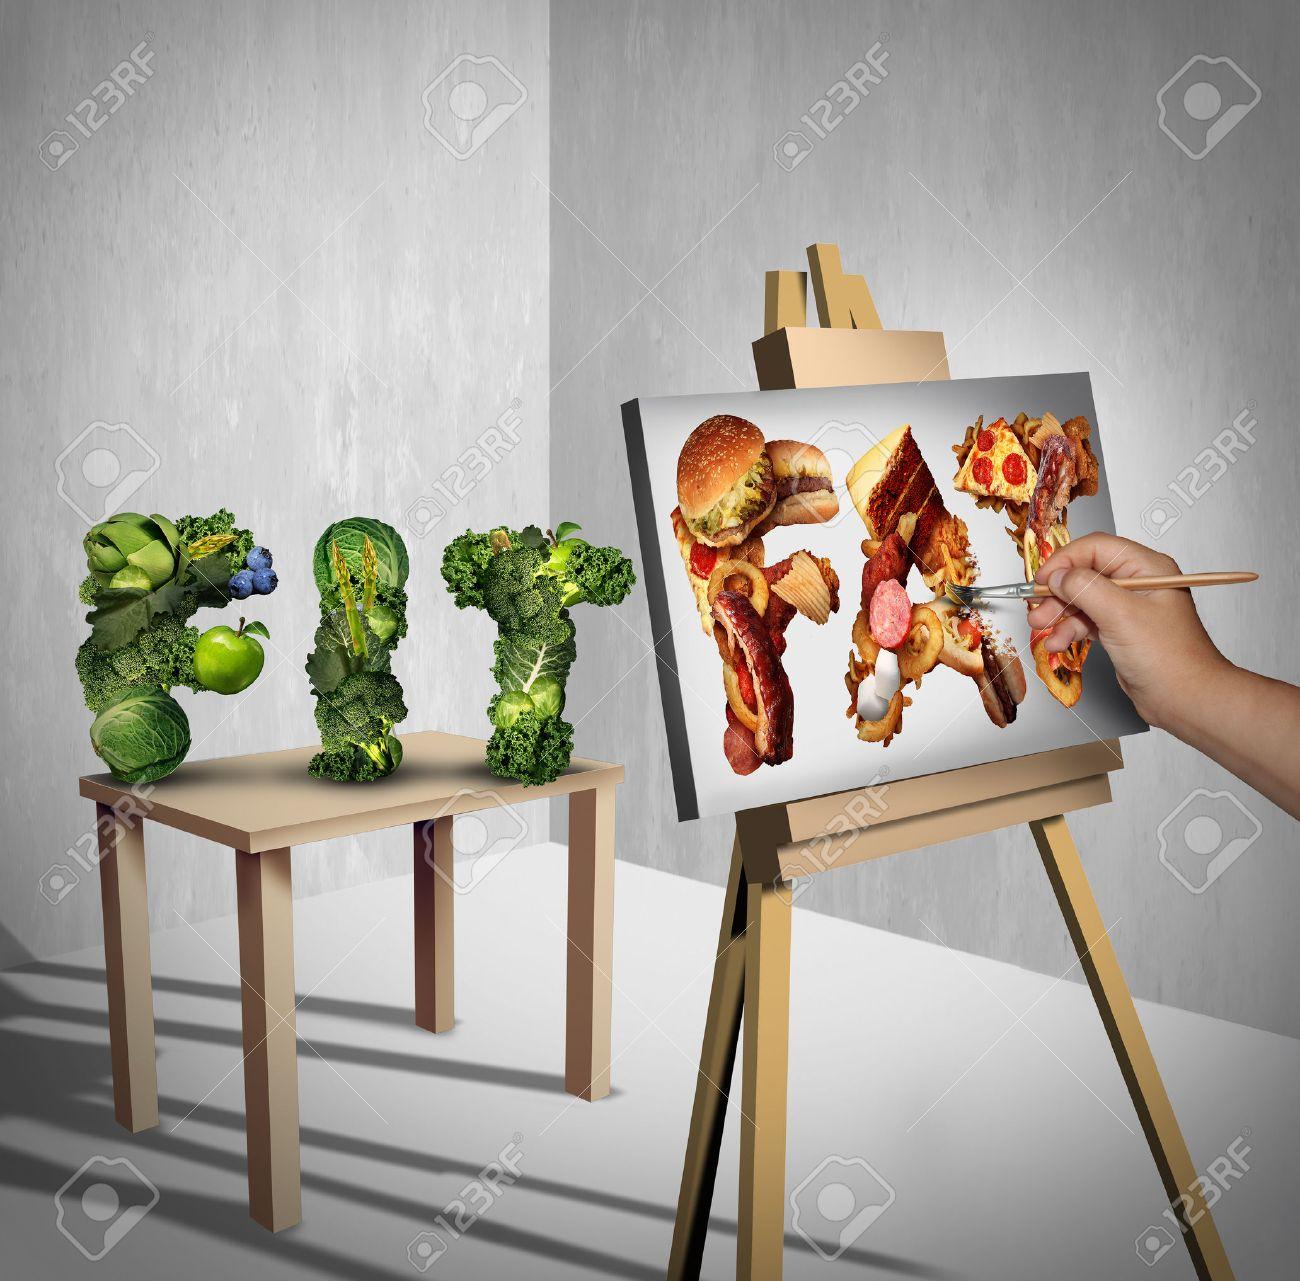 Lebensmittel Versuchung Konzept Als Grünes Gemüse Als Fit Wort ...